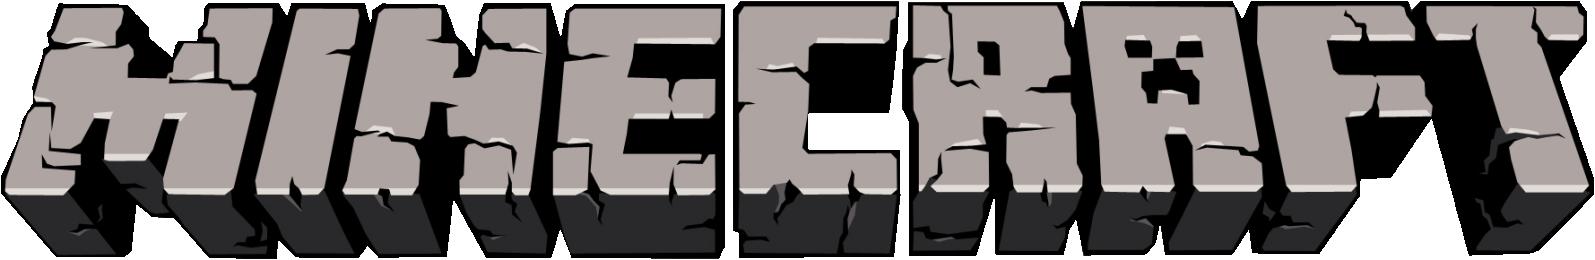 Minecraft Server Hosting! VPS